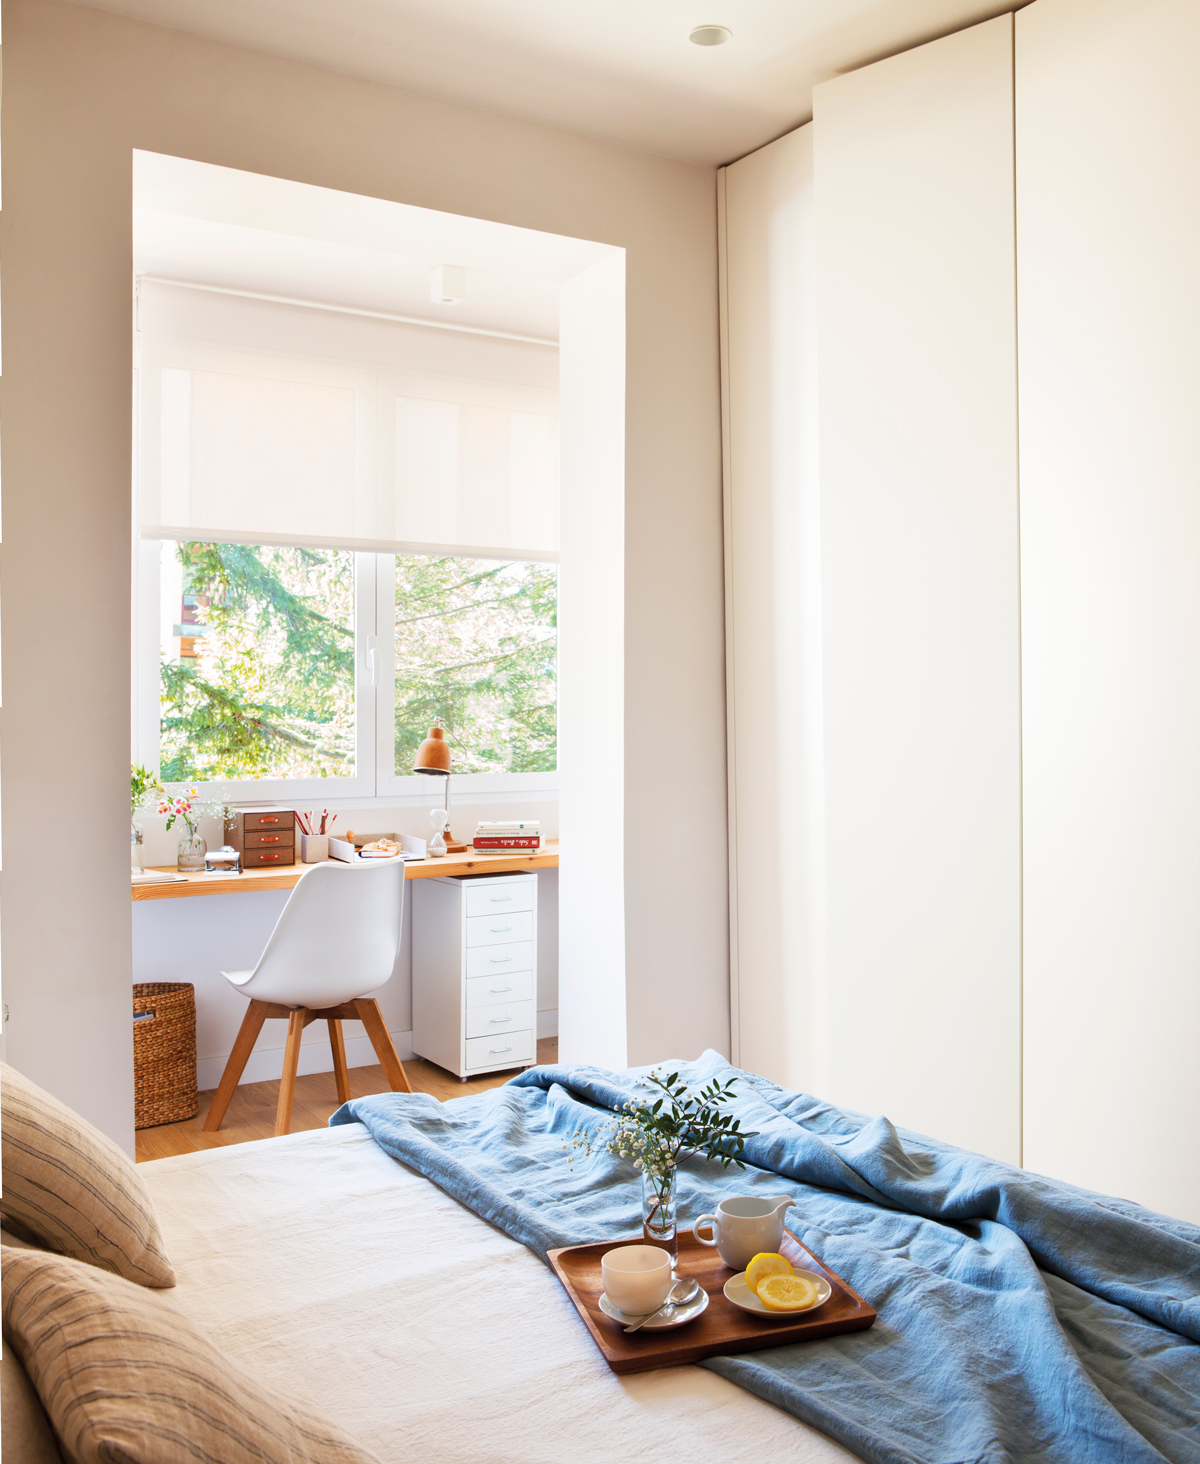 Ideas para crear un rinc n de estudio inspirador - Escritorio dormitorio ...